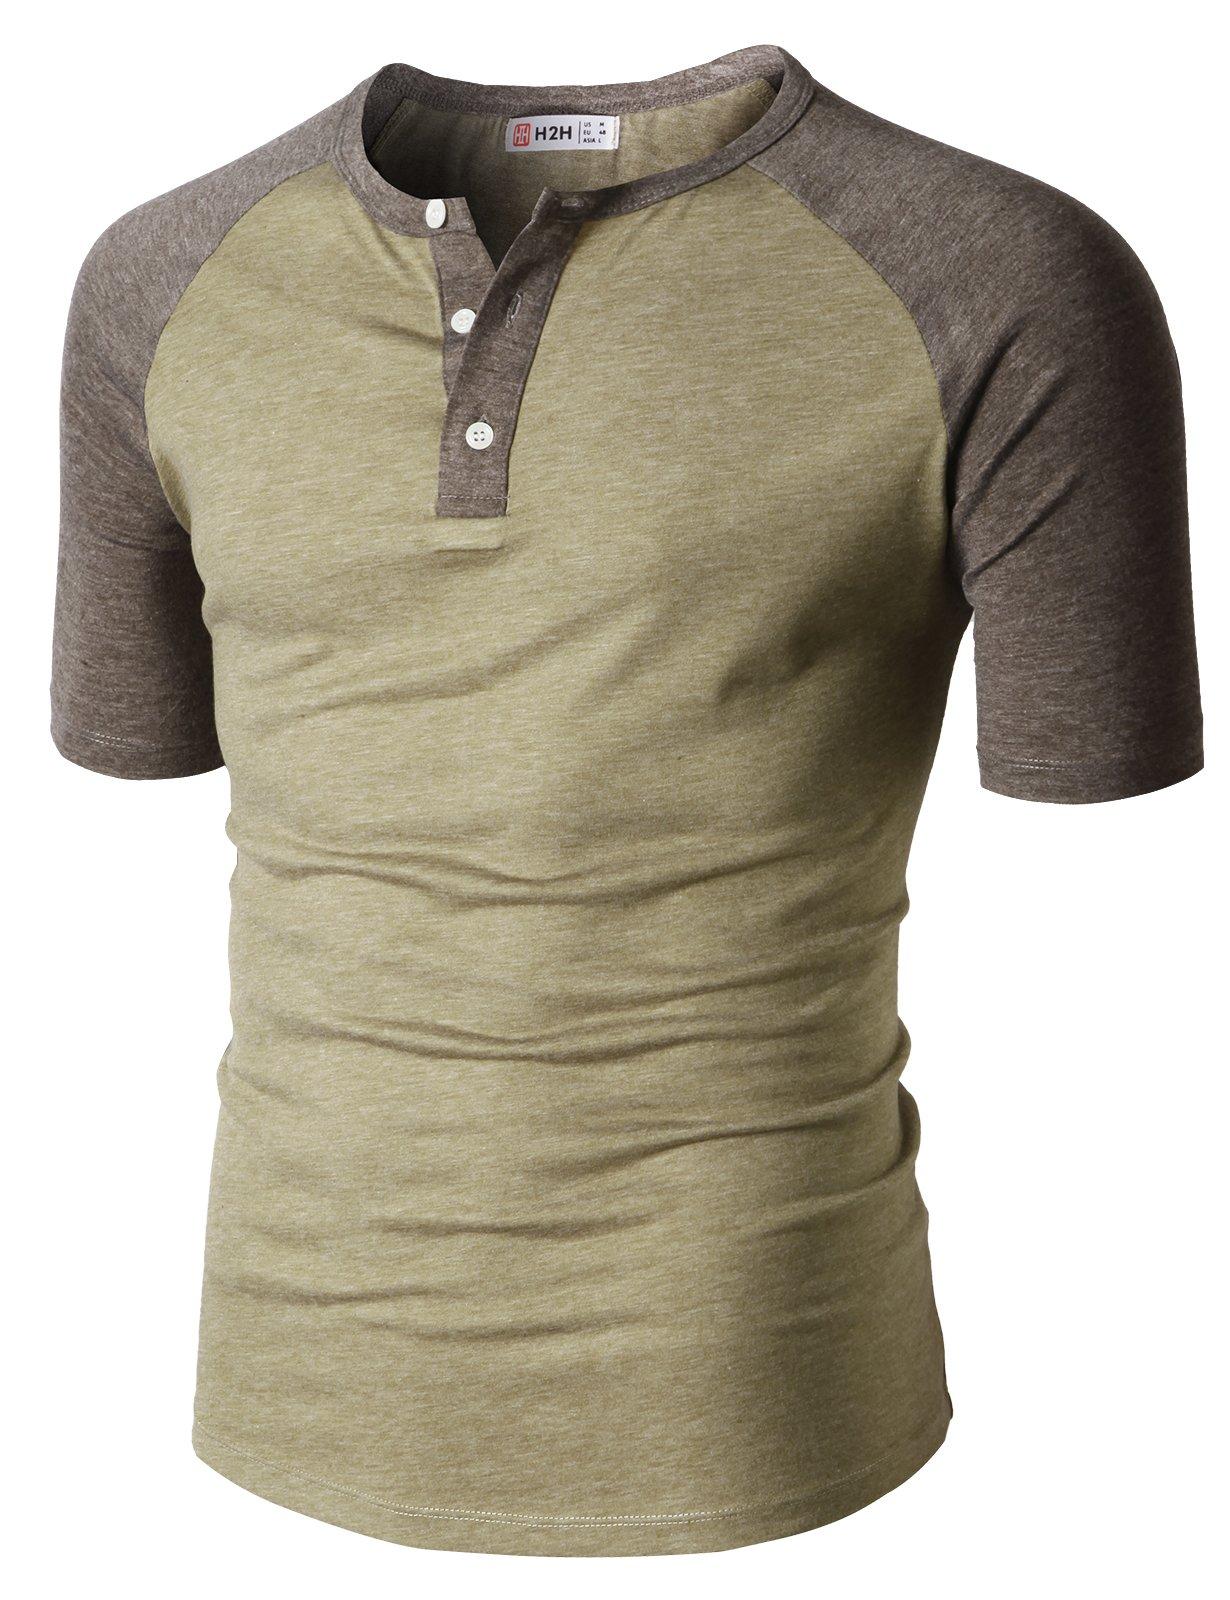 H2H Men Slim Fit Henley Raglan Short Sleeve Contrast Color Block Casual Baseball T-Shirt HEATHERBEIGE US M/Asia L (CMTTS0222)